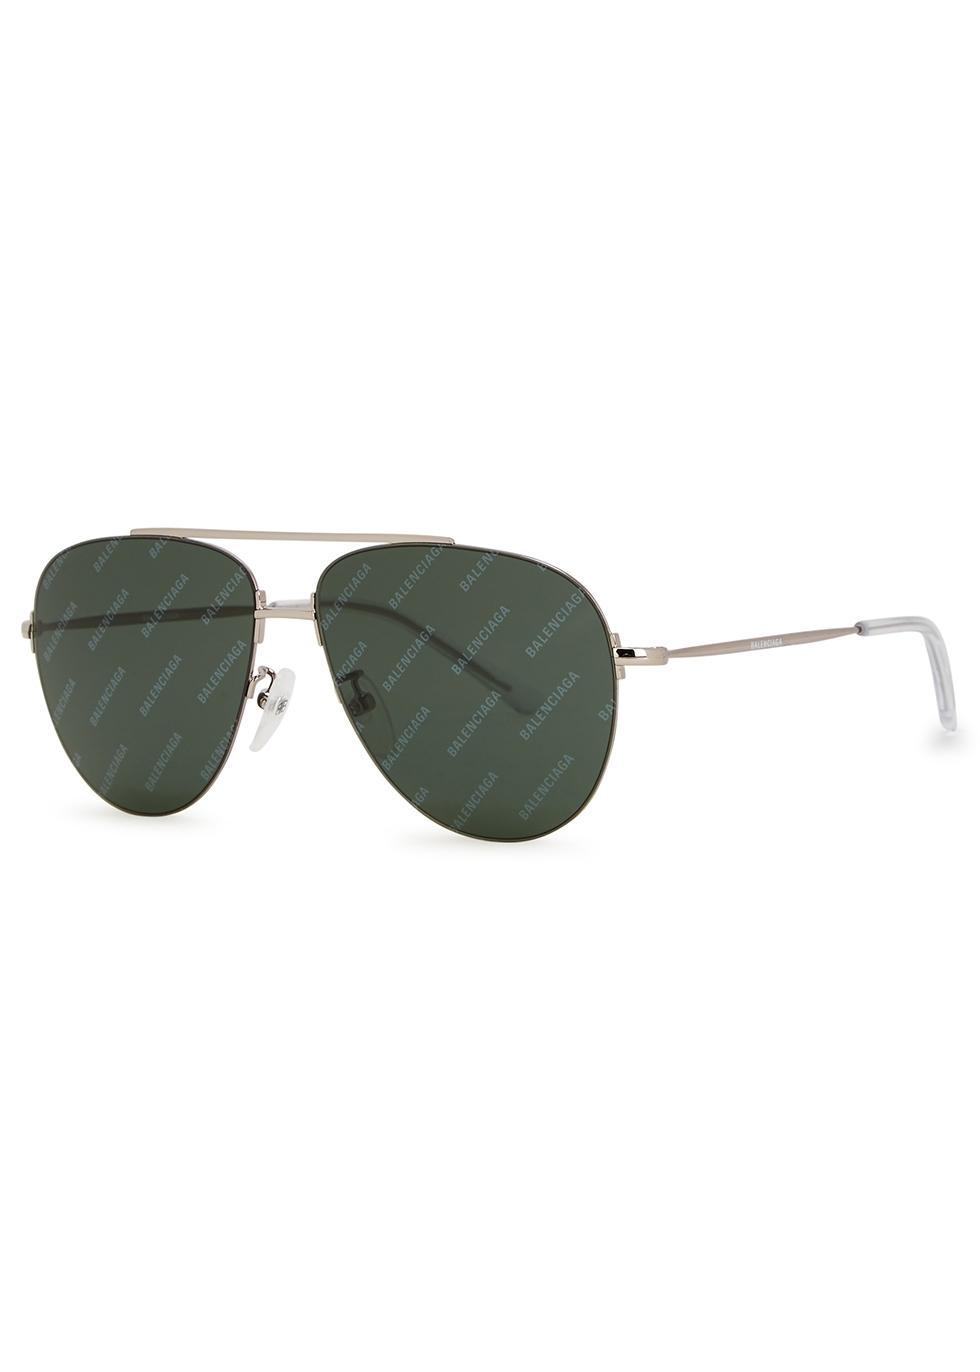 3a1ea65e0963 Men's Designer Sunglasses & Eyewear - Harvey Nichols